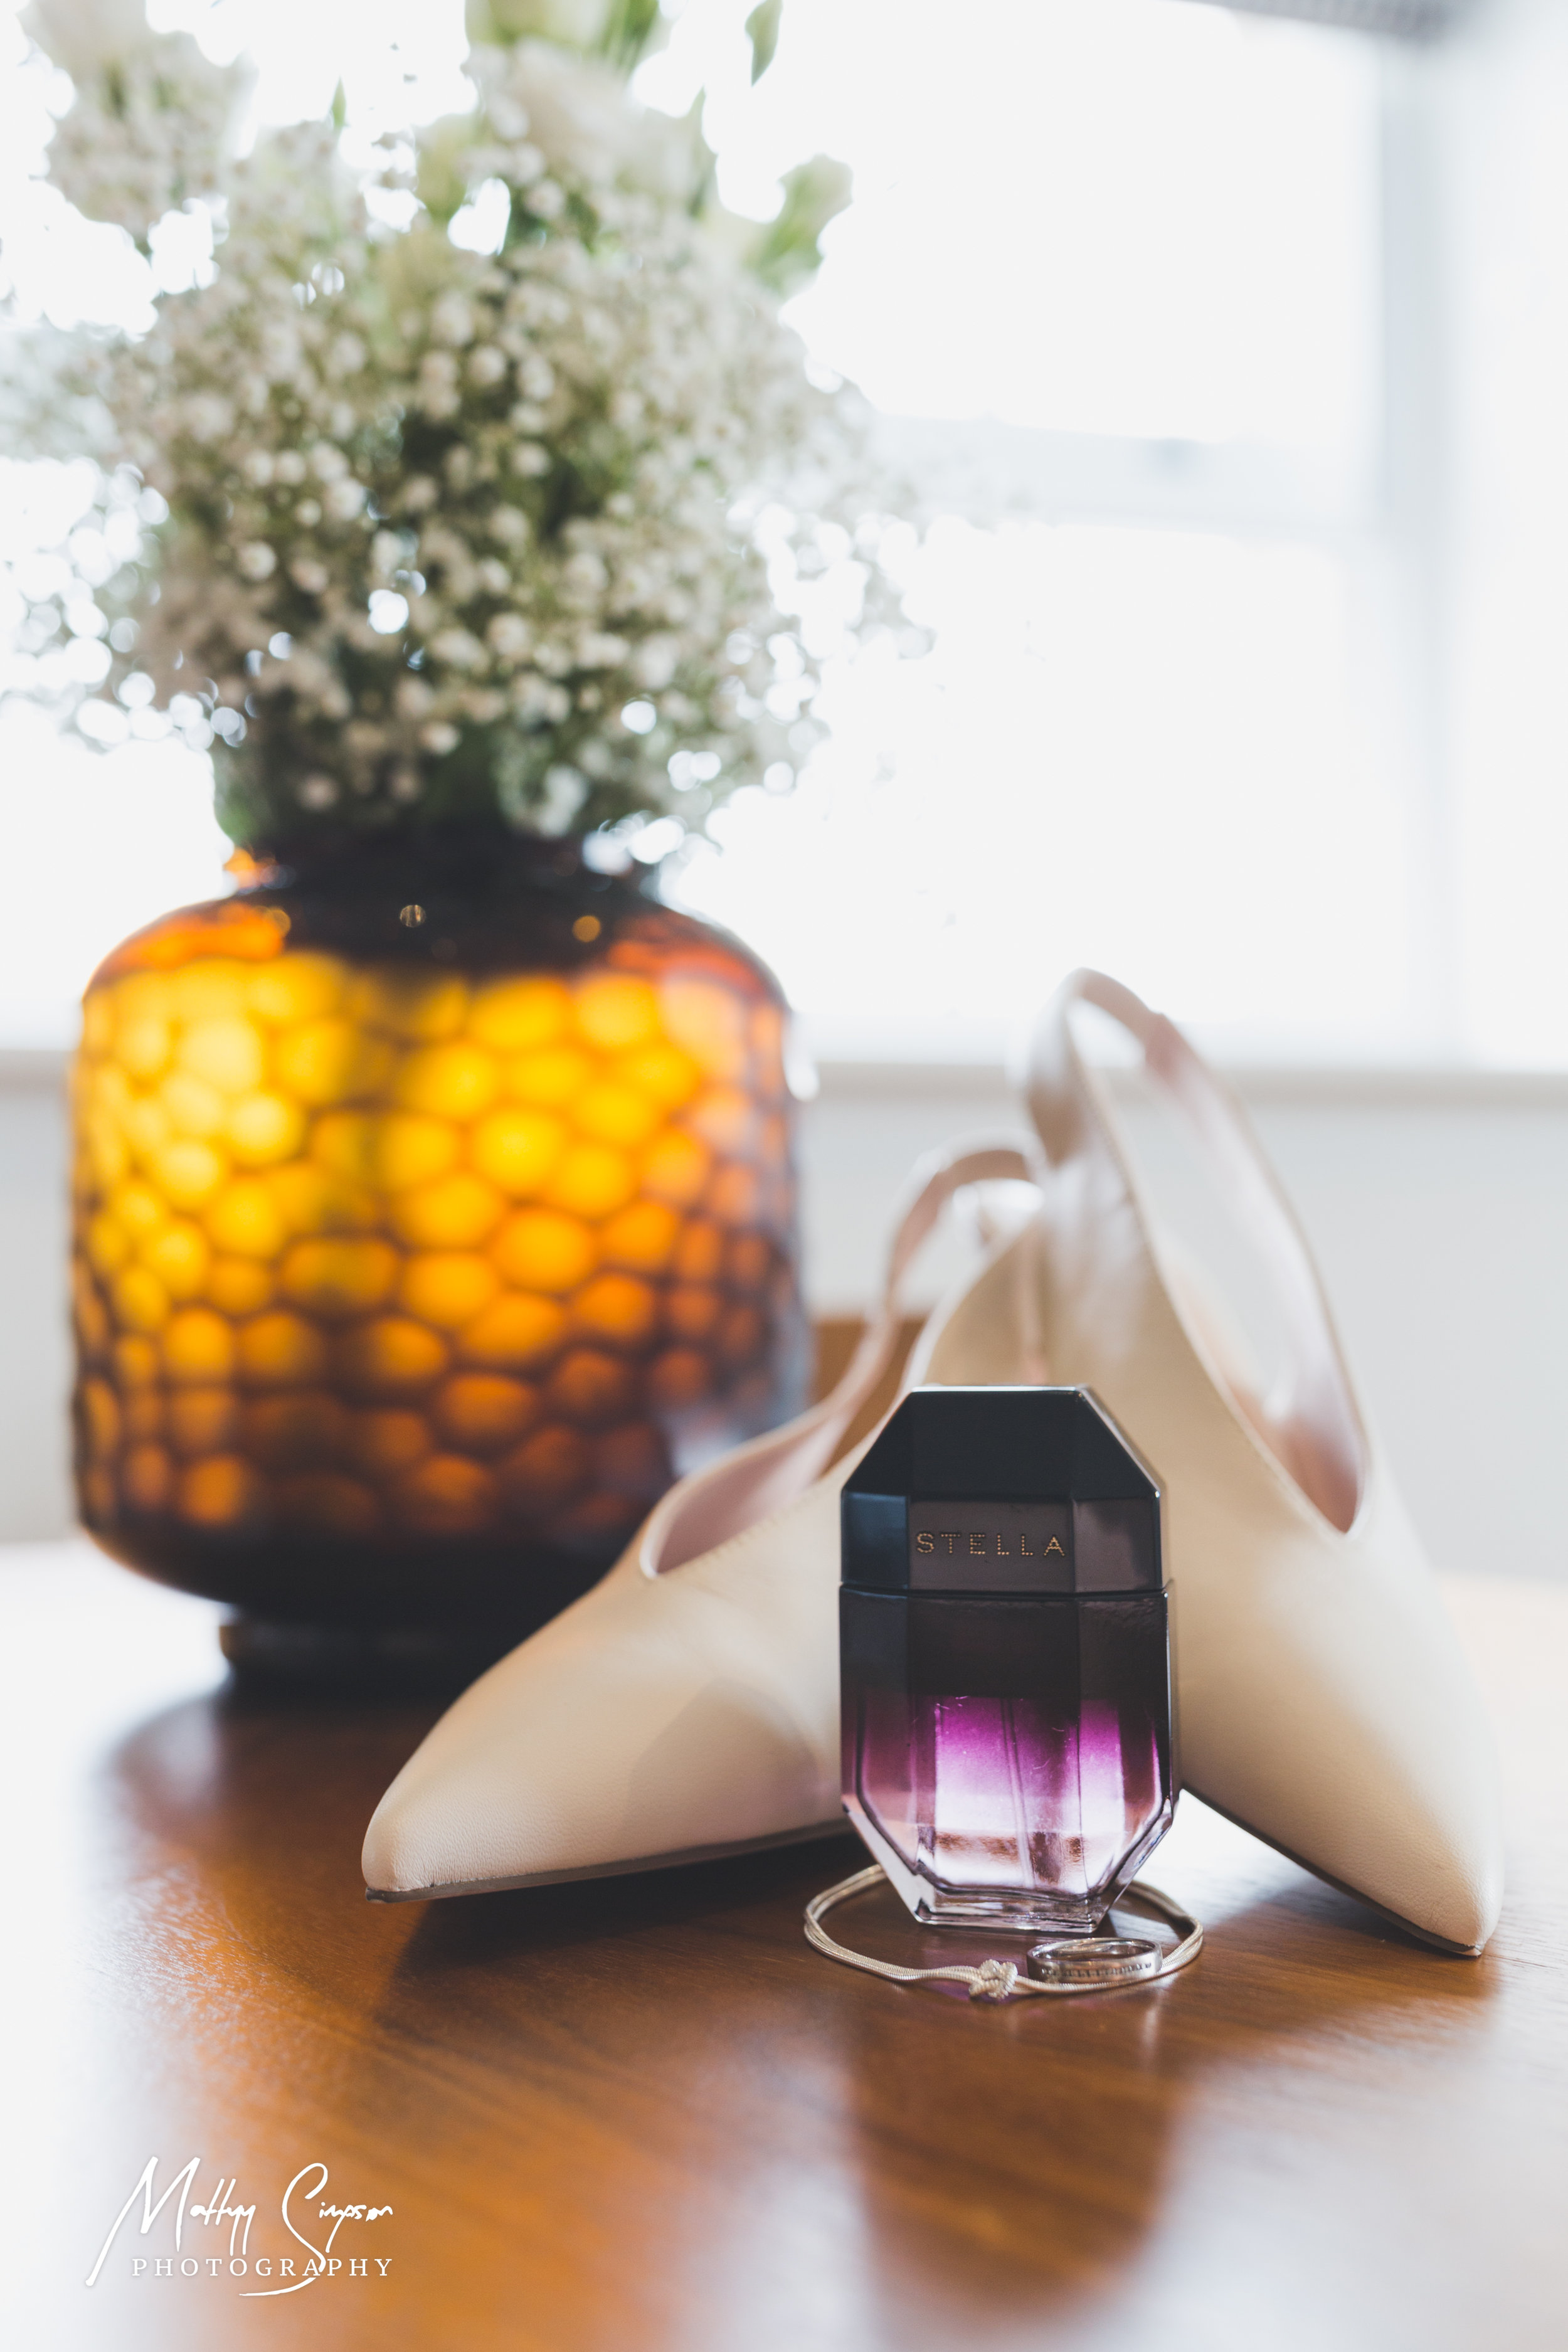 Perfume, wedding shoes, bracelet, engagement ring & flowers